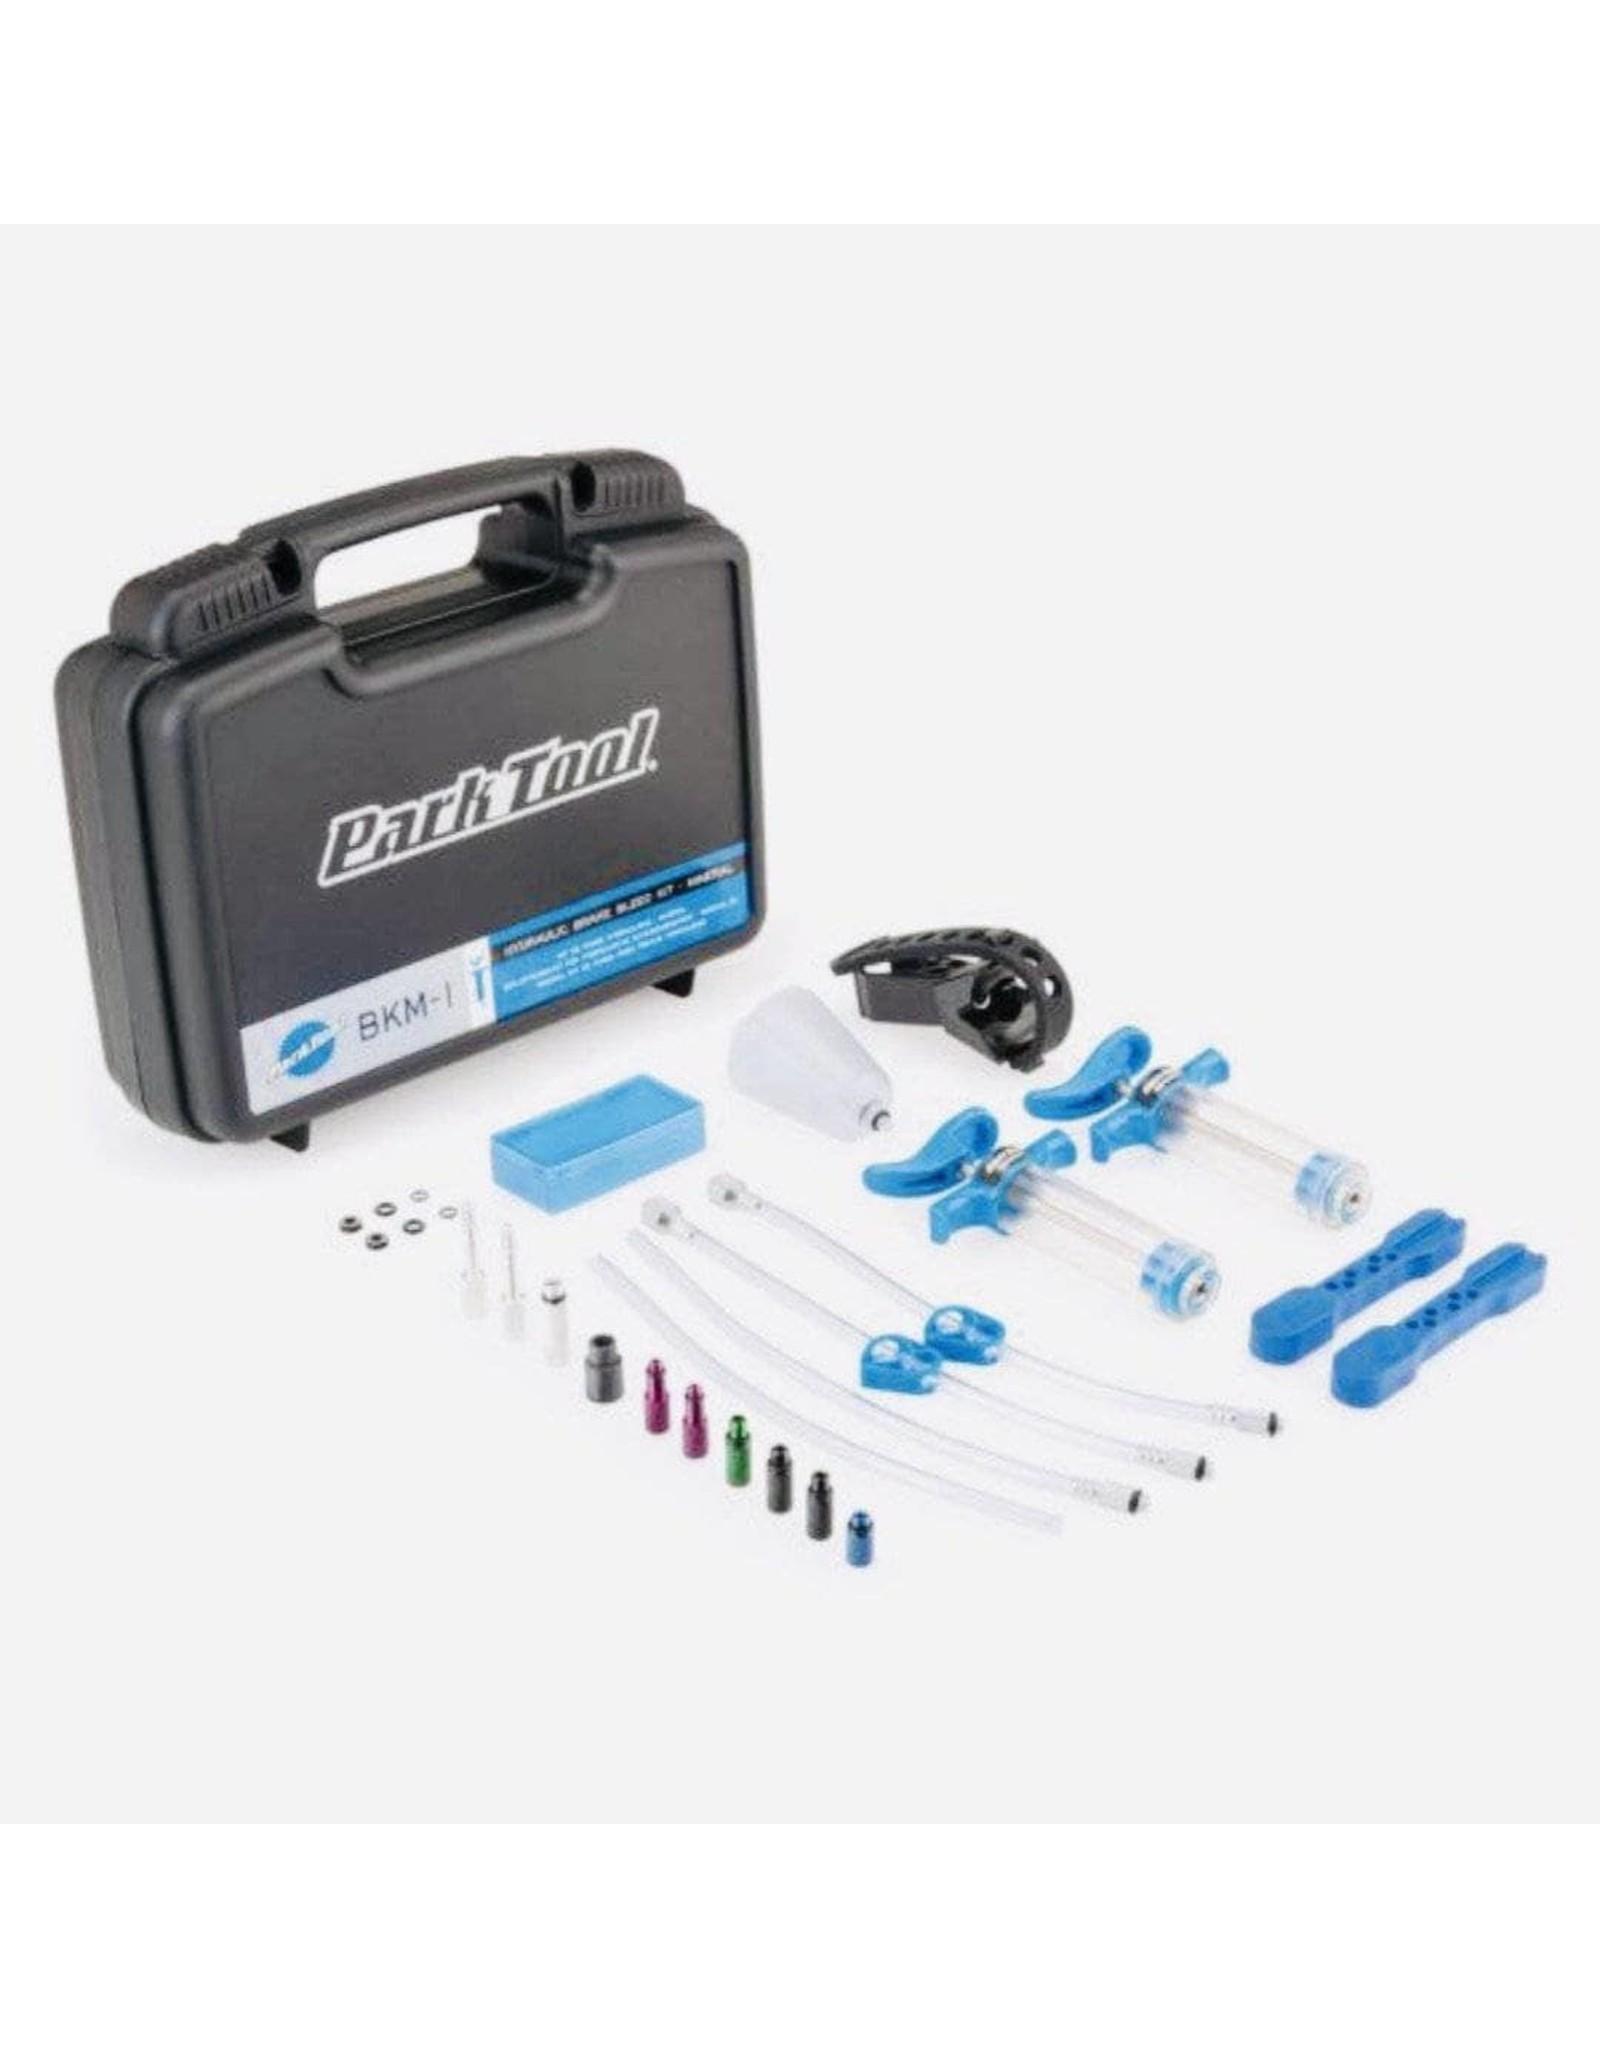 Park Tool Park Tool BKM-1, Mineral Oil Bleed Kit